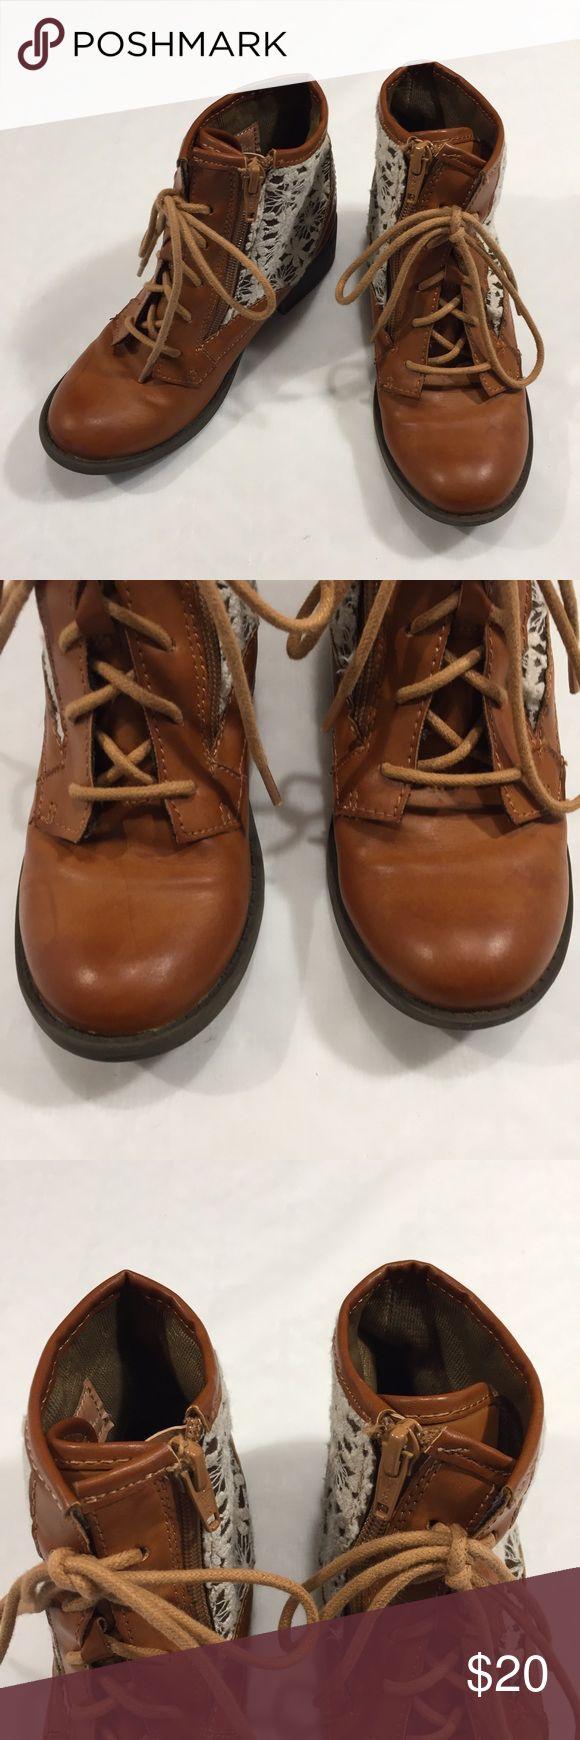 Steve Madden Kids Boots Size 1 Z Steve Madden Shoes Boots